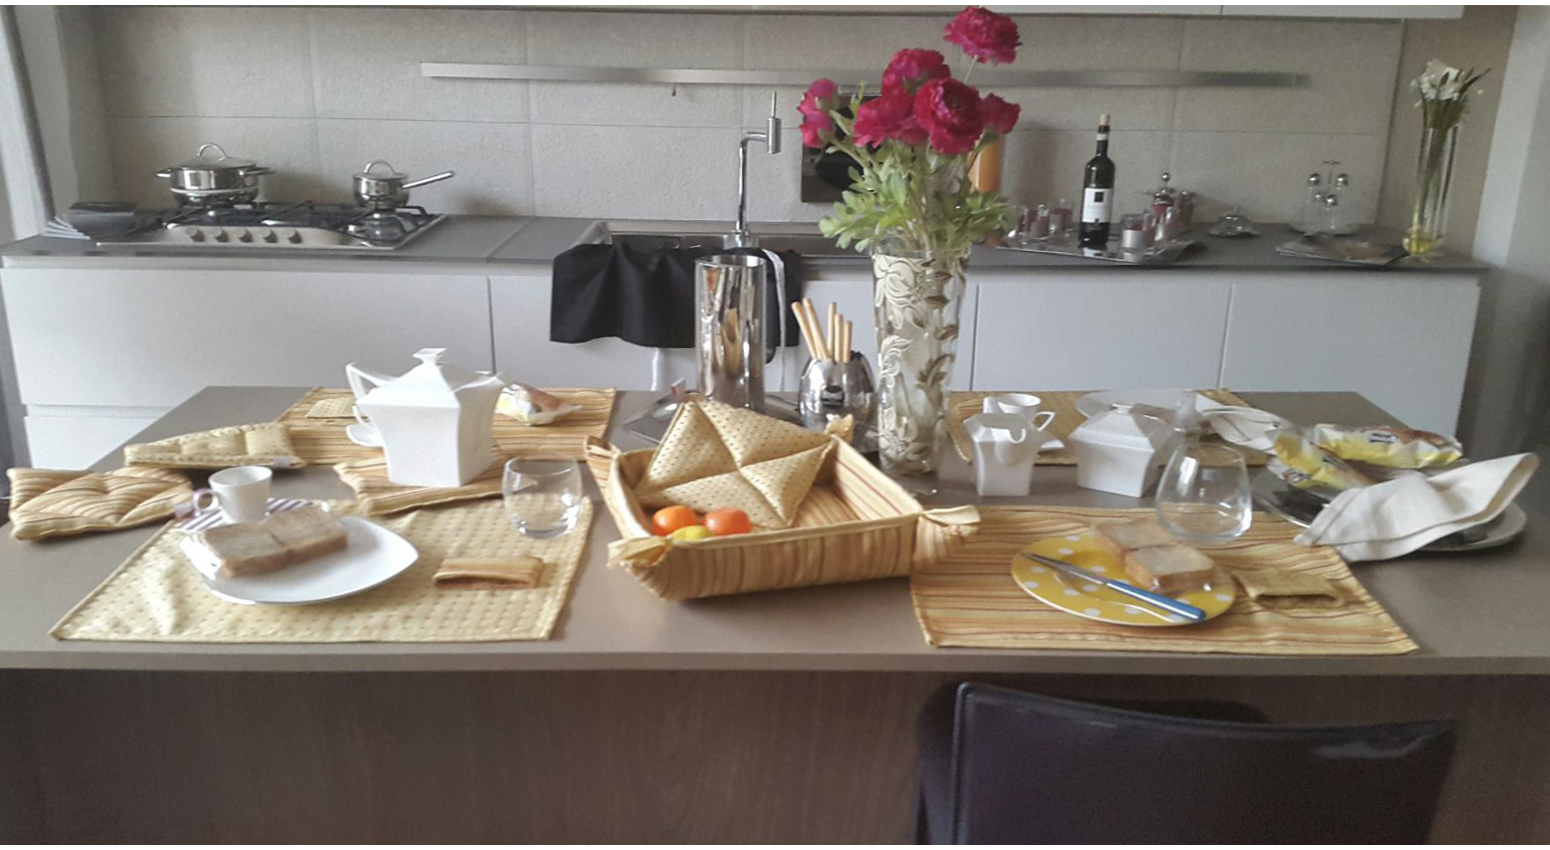 Blog pellegrino arreda cucine arredamenti for Pellegrino arredamenti